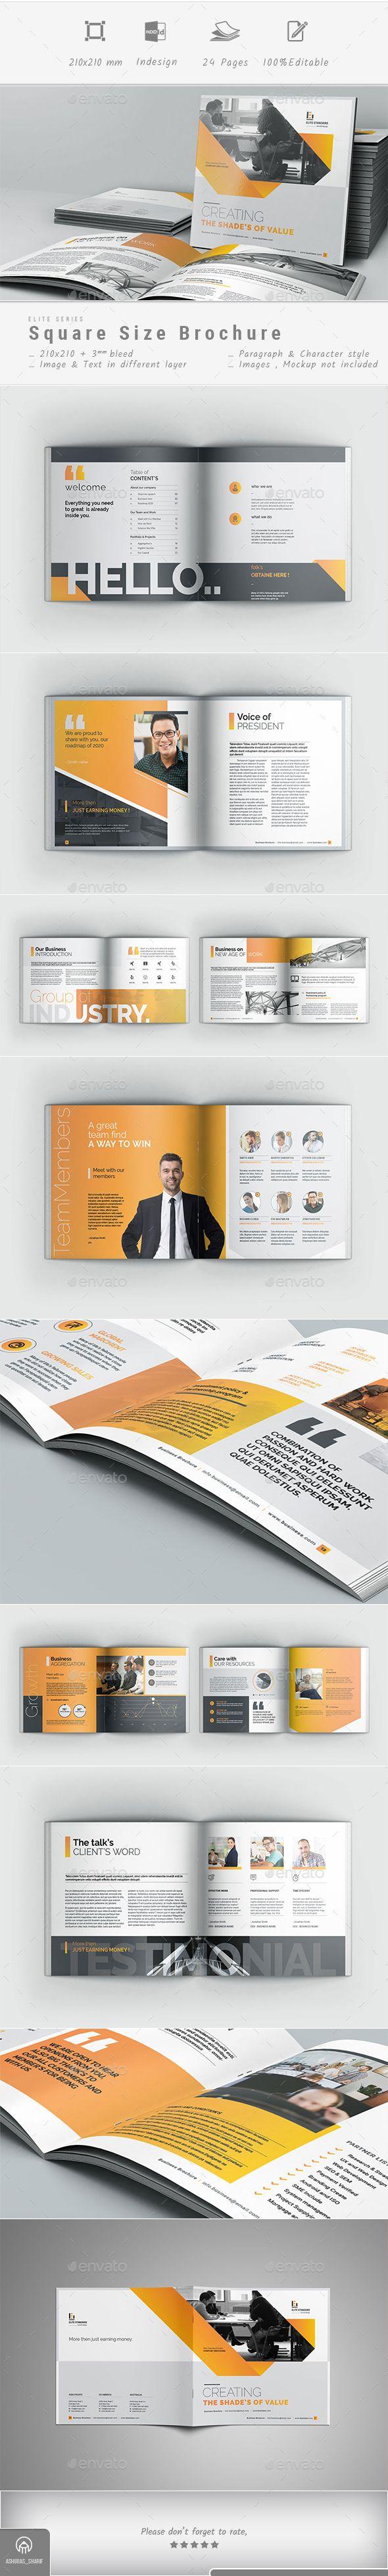 Brochure Template InDesign INDD